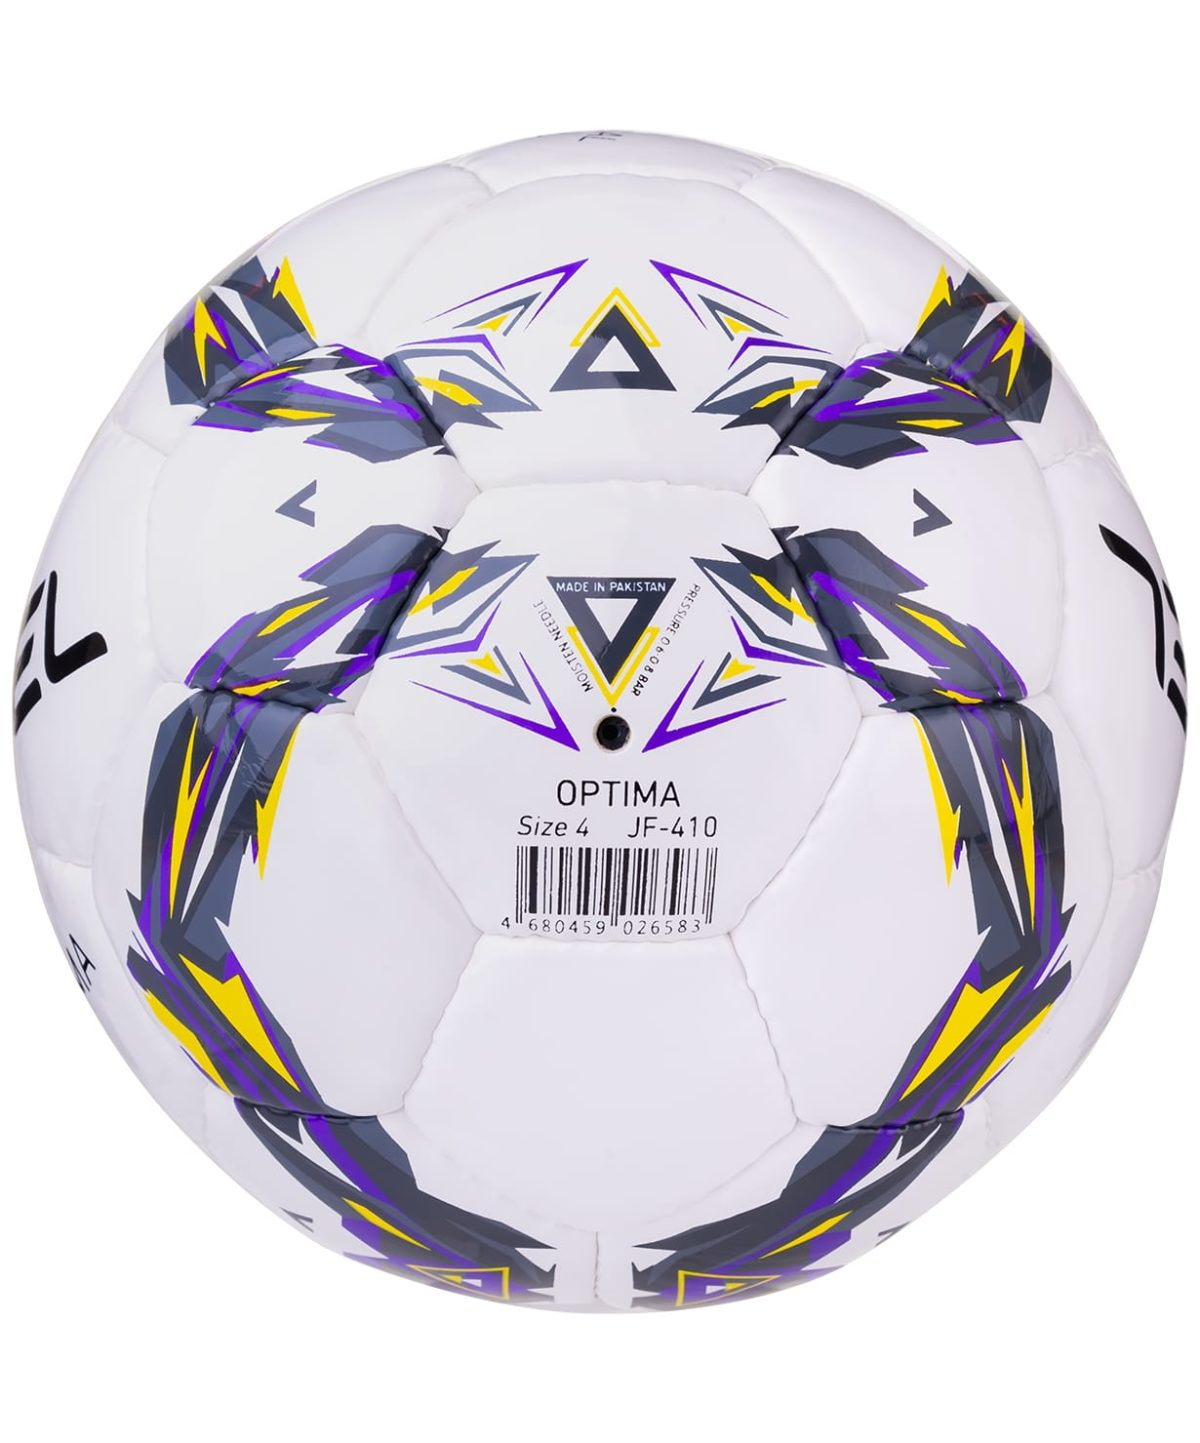 JOGEL Optima Мяч футзальный  JF-410 №4 - 2